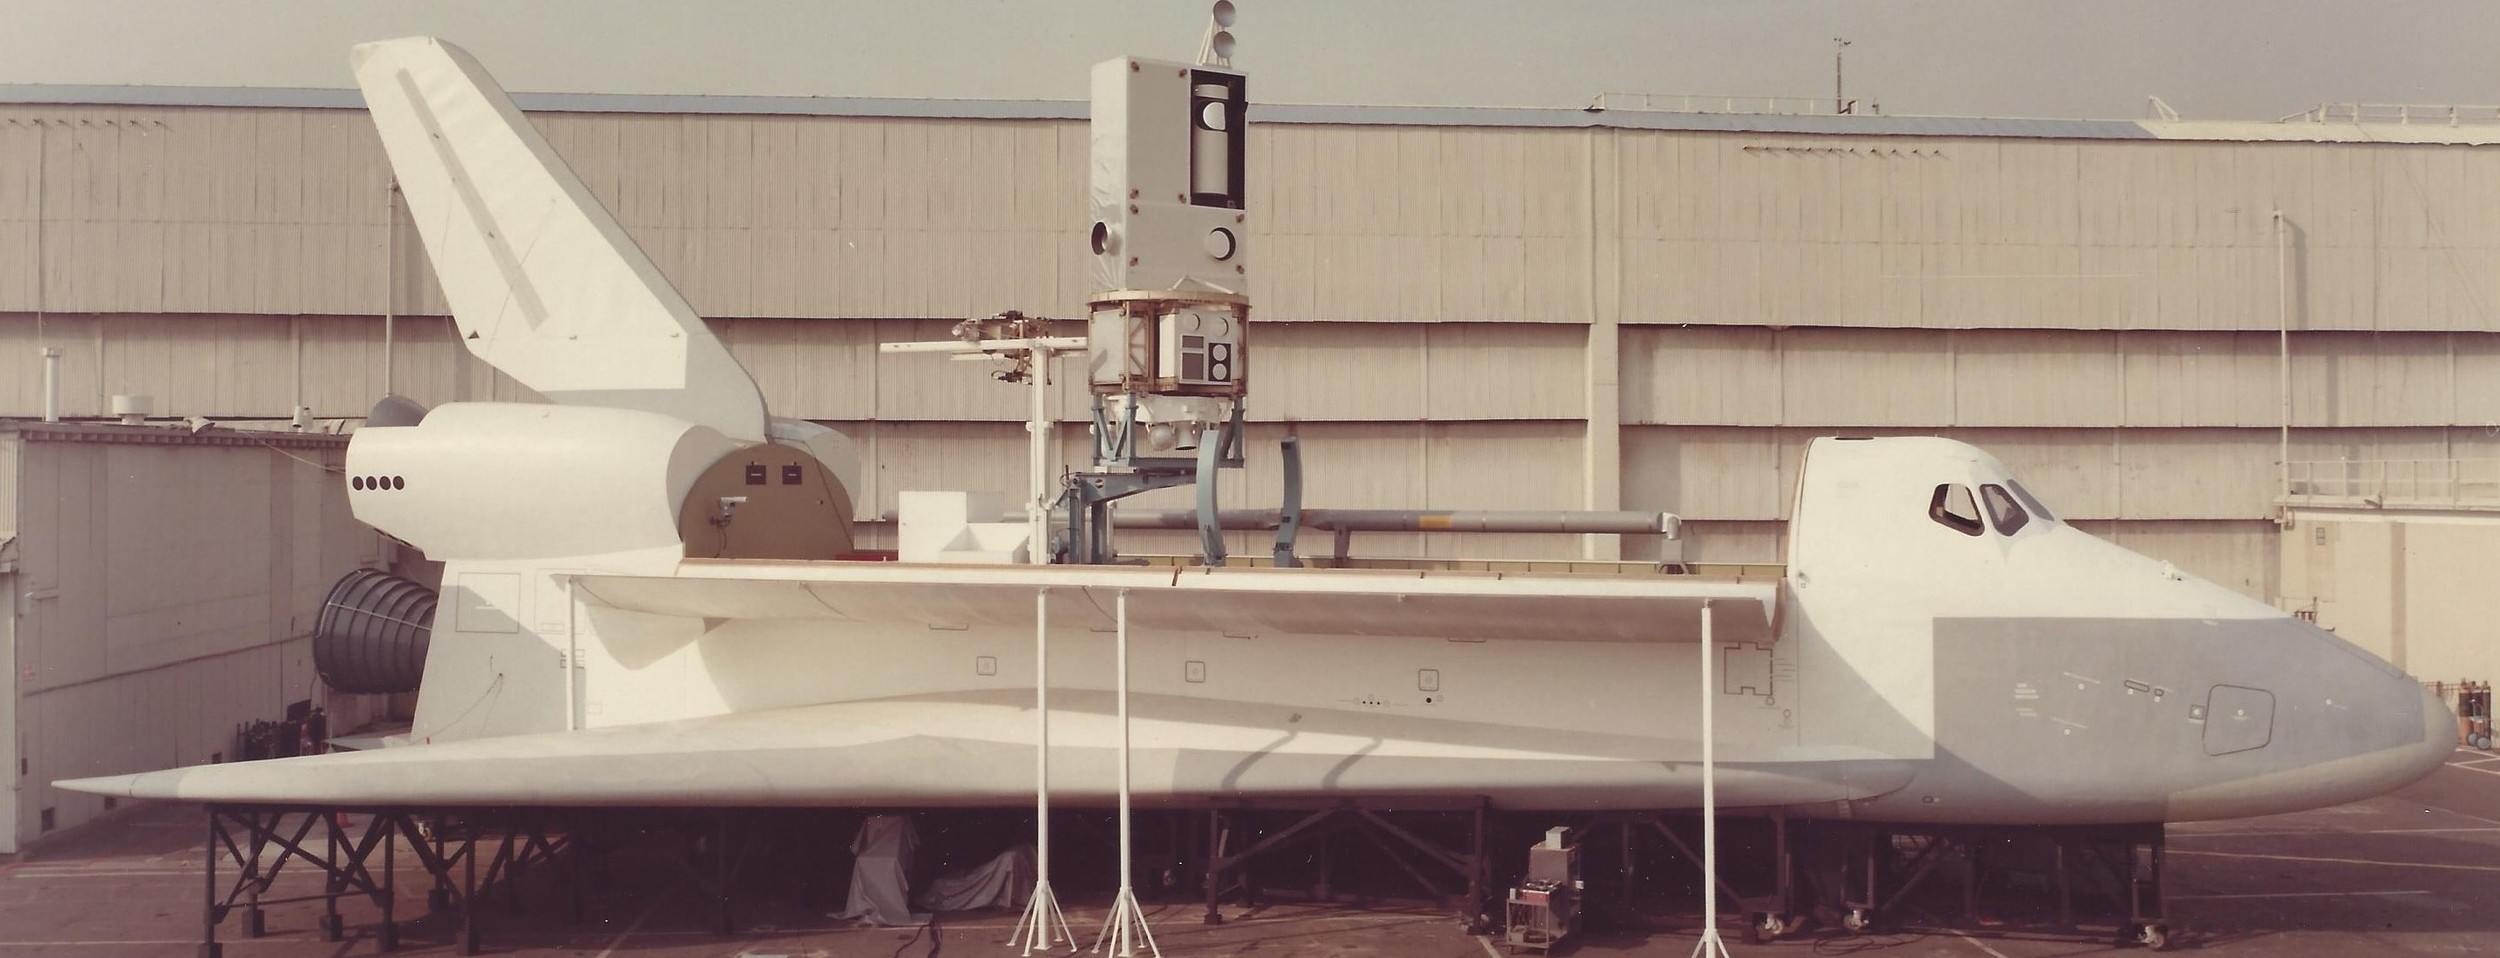 Early Shuttle designs